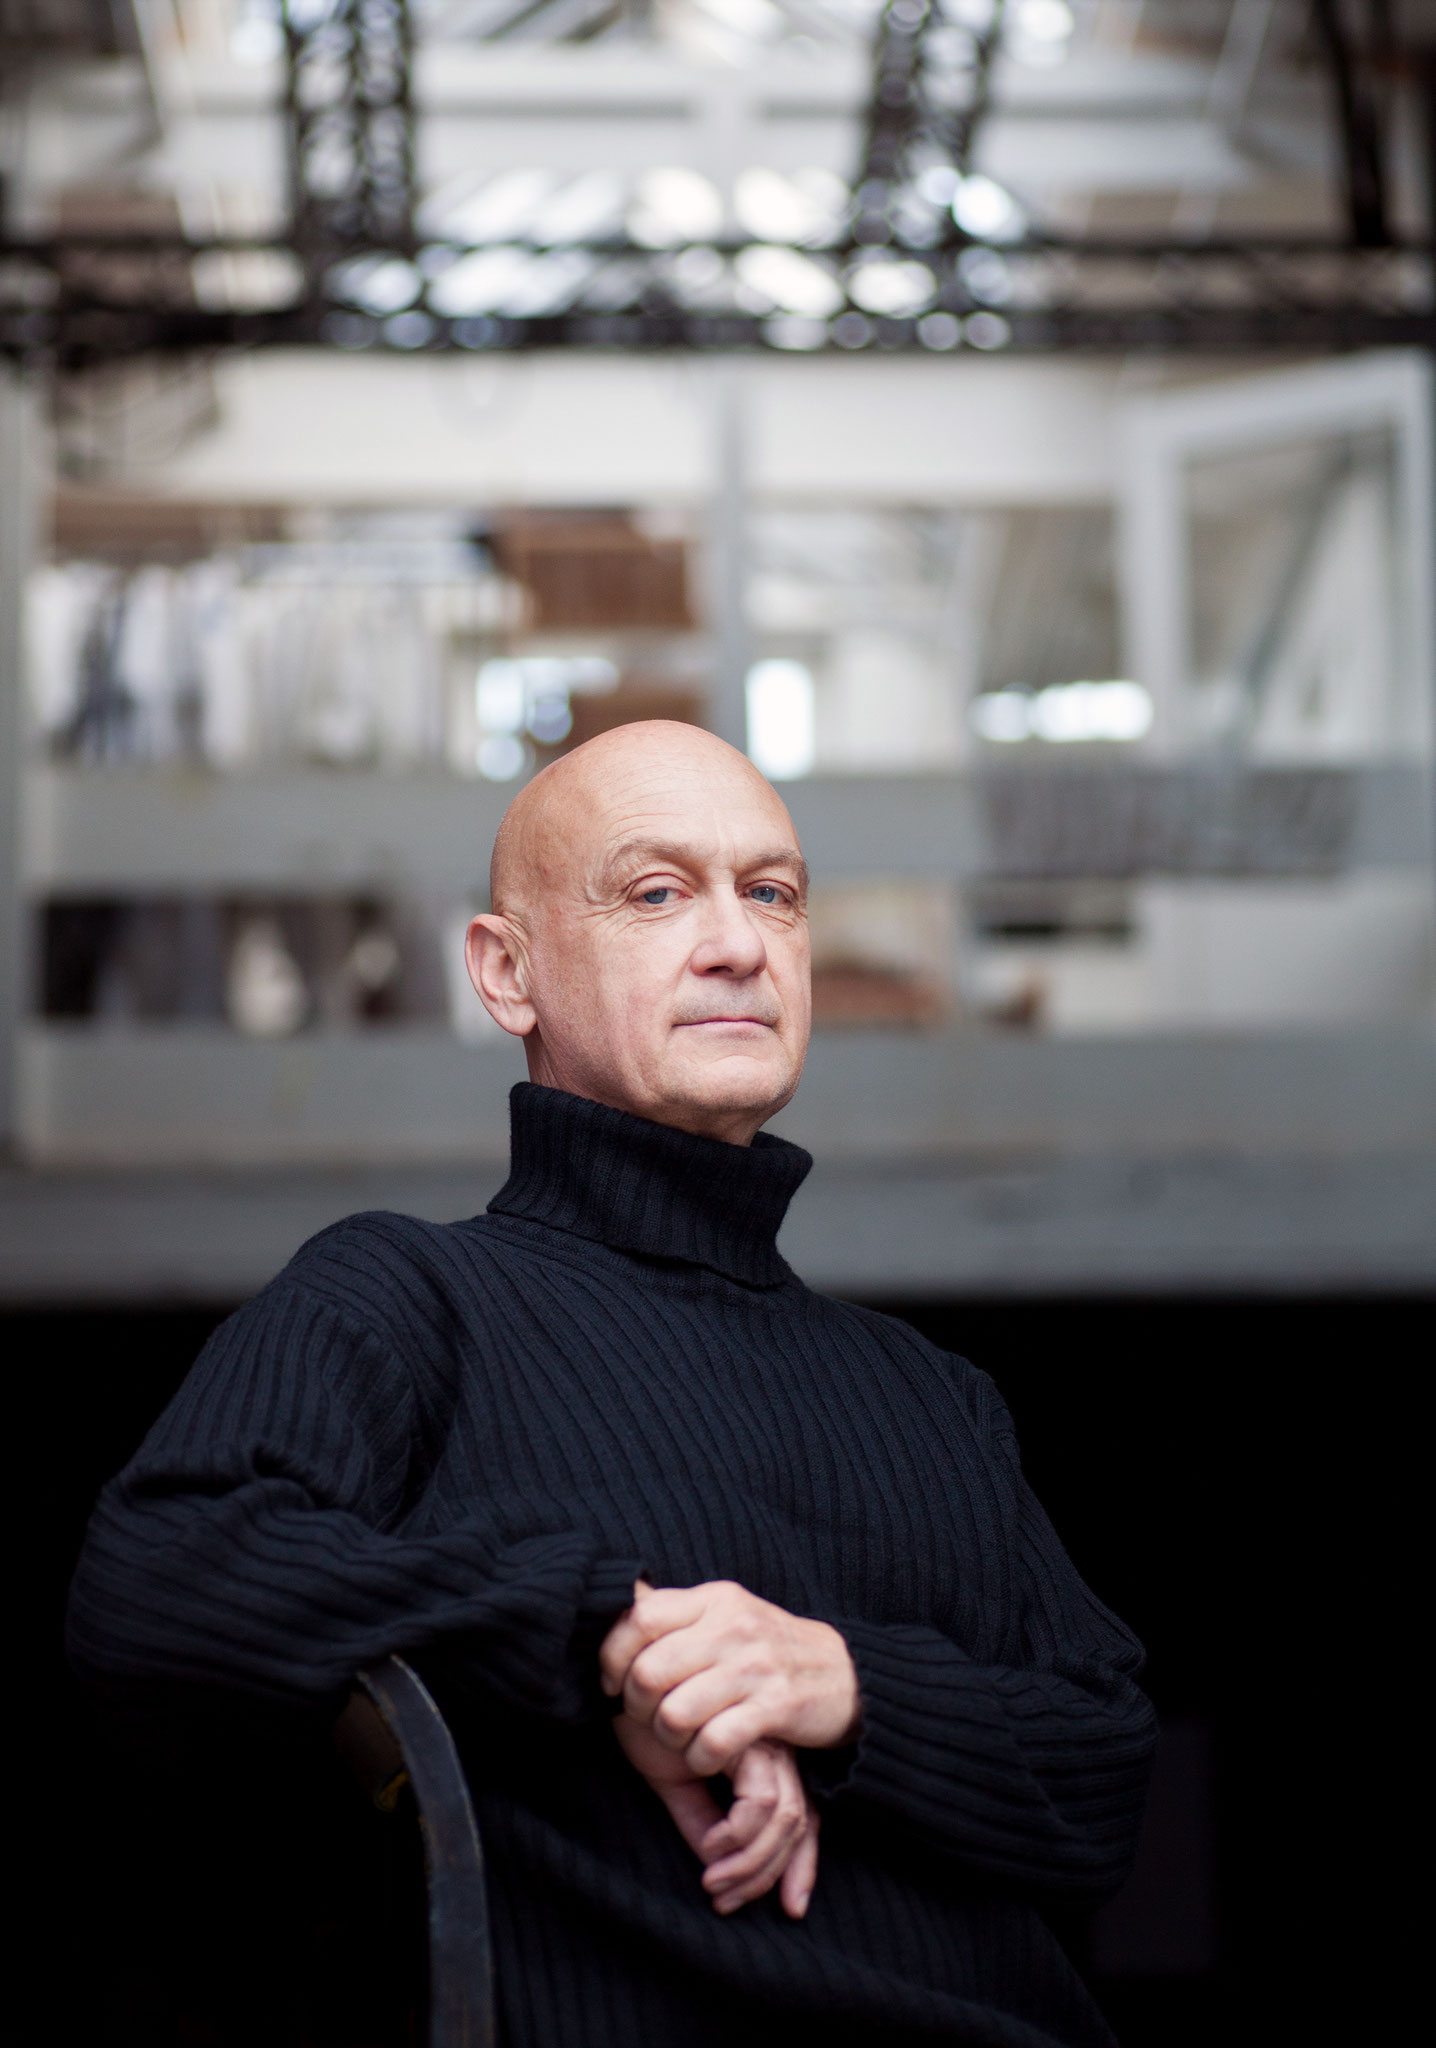 MICHAEL ELBER |ZÜRICH | Contemporary Art Photography